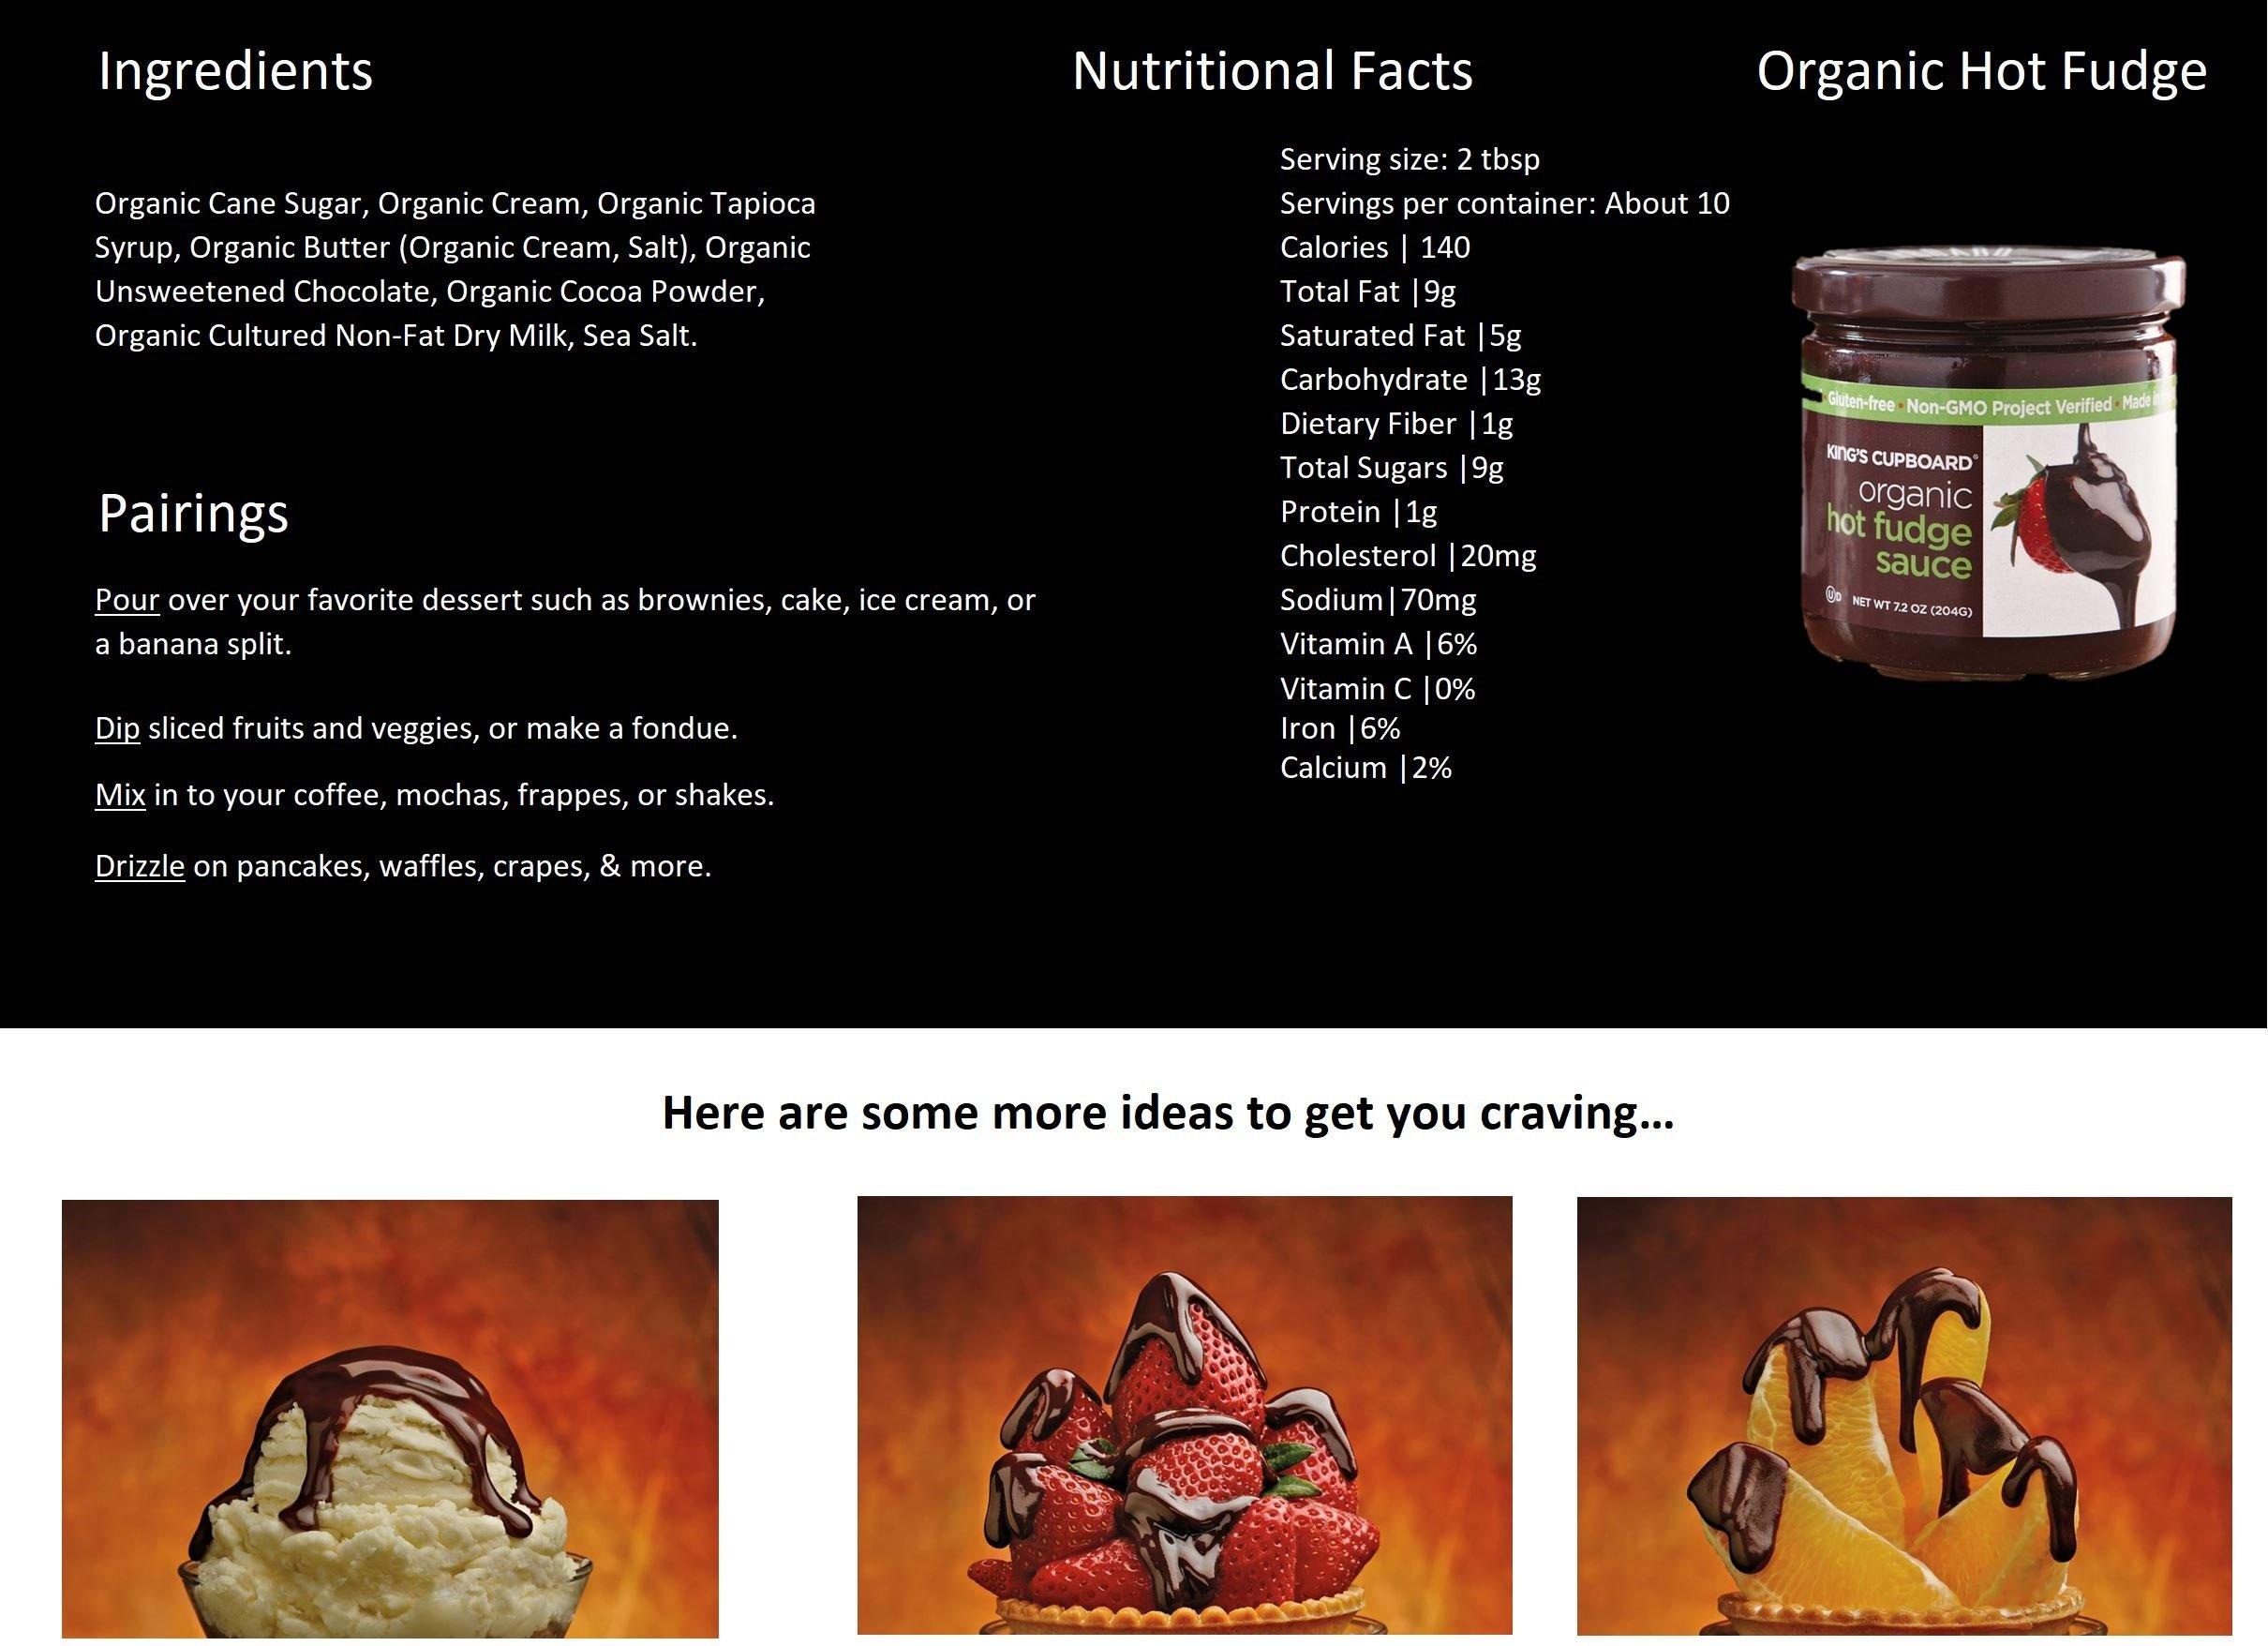 The King's Cupboard Original Organic Sampler Gift Set of Hot Fudge & Caramel Sauce by The King's Cupboard (Image #3)